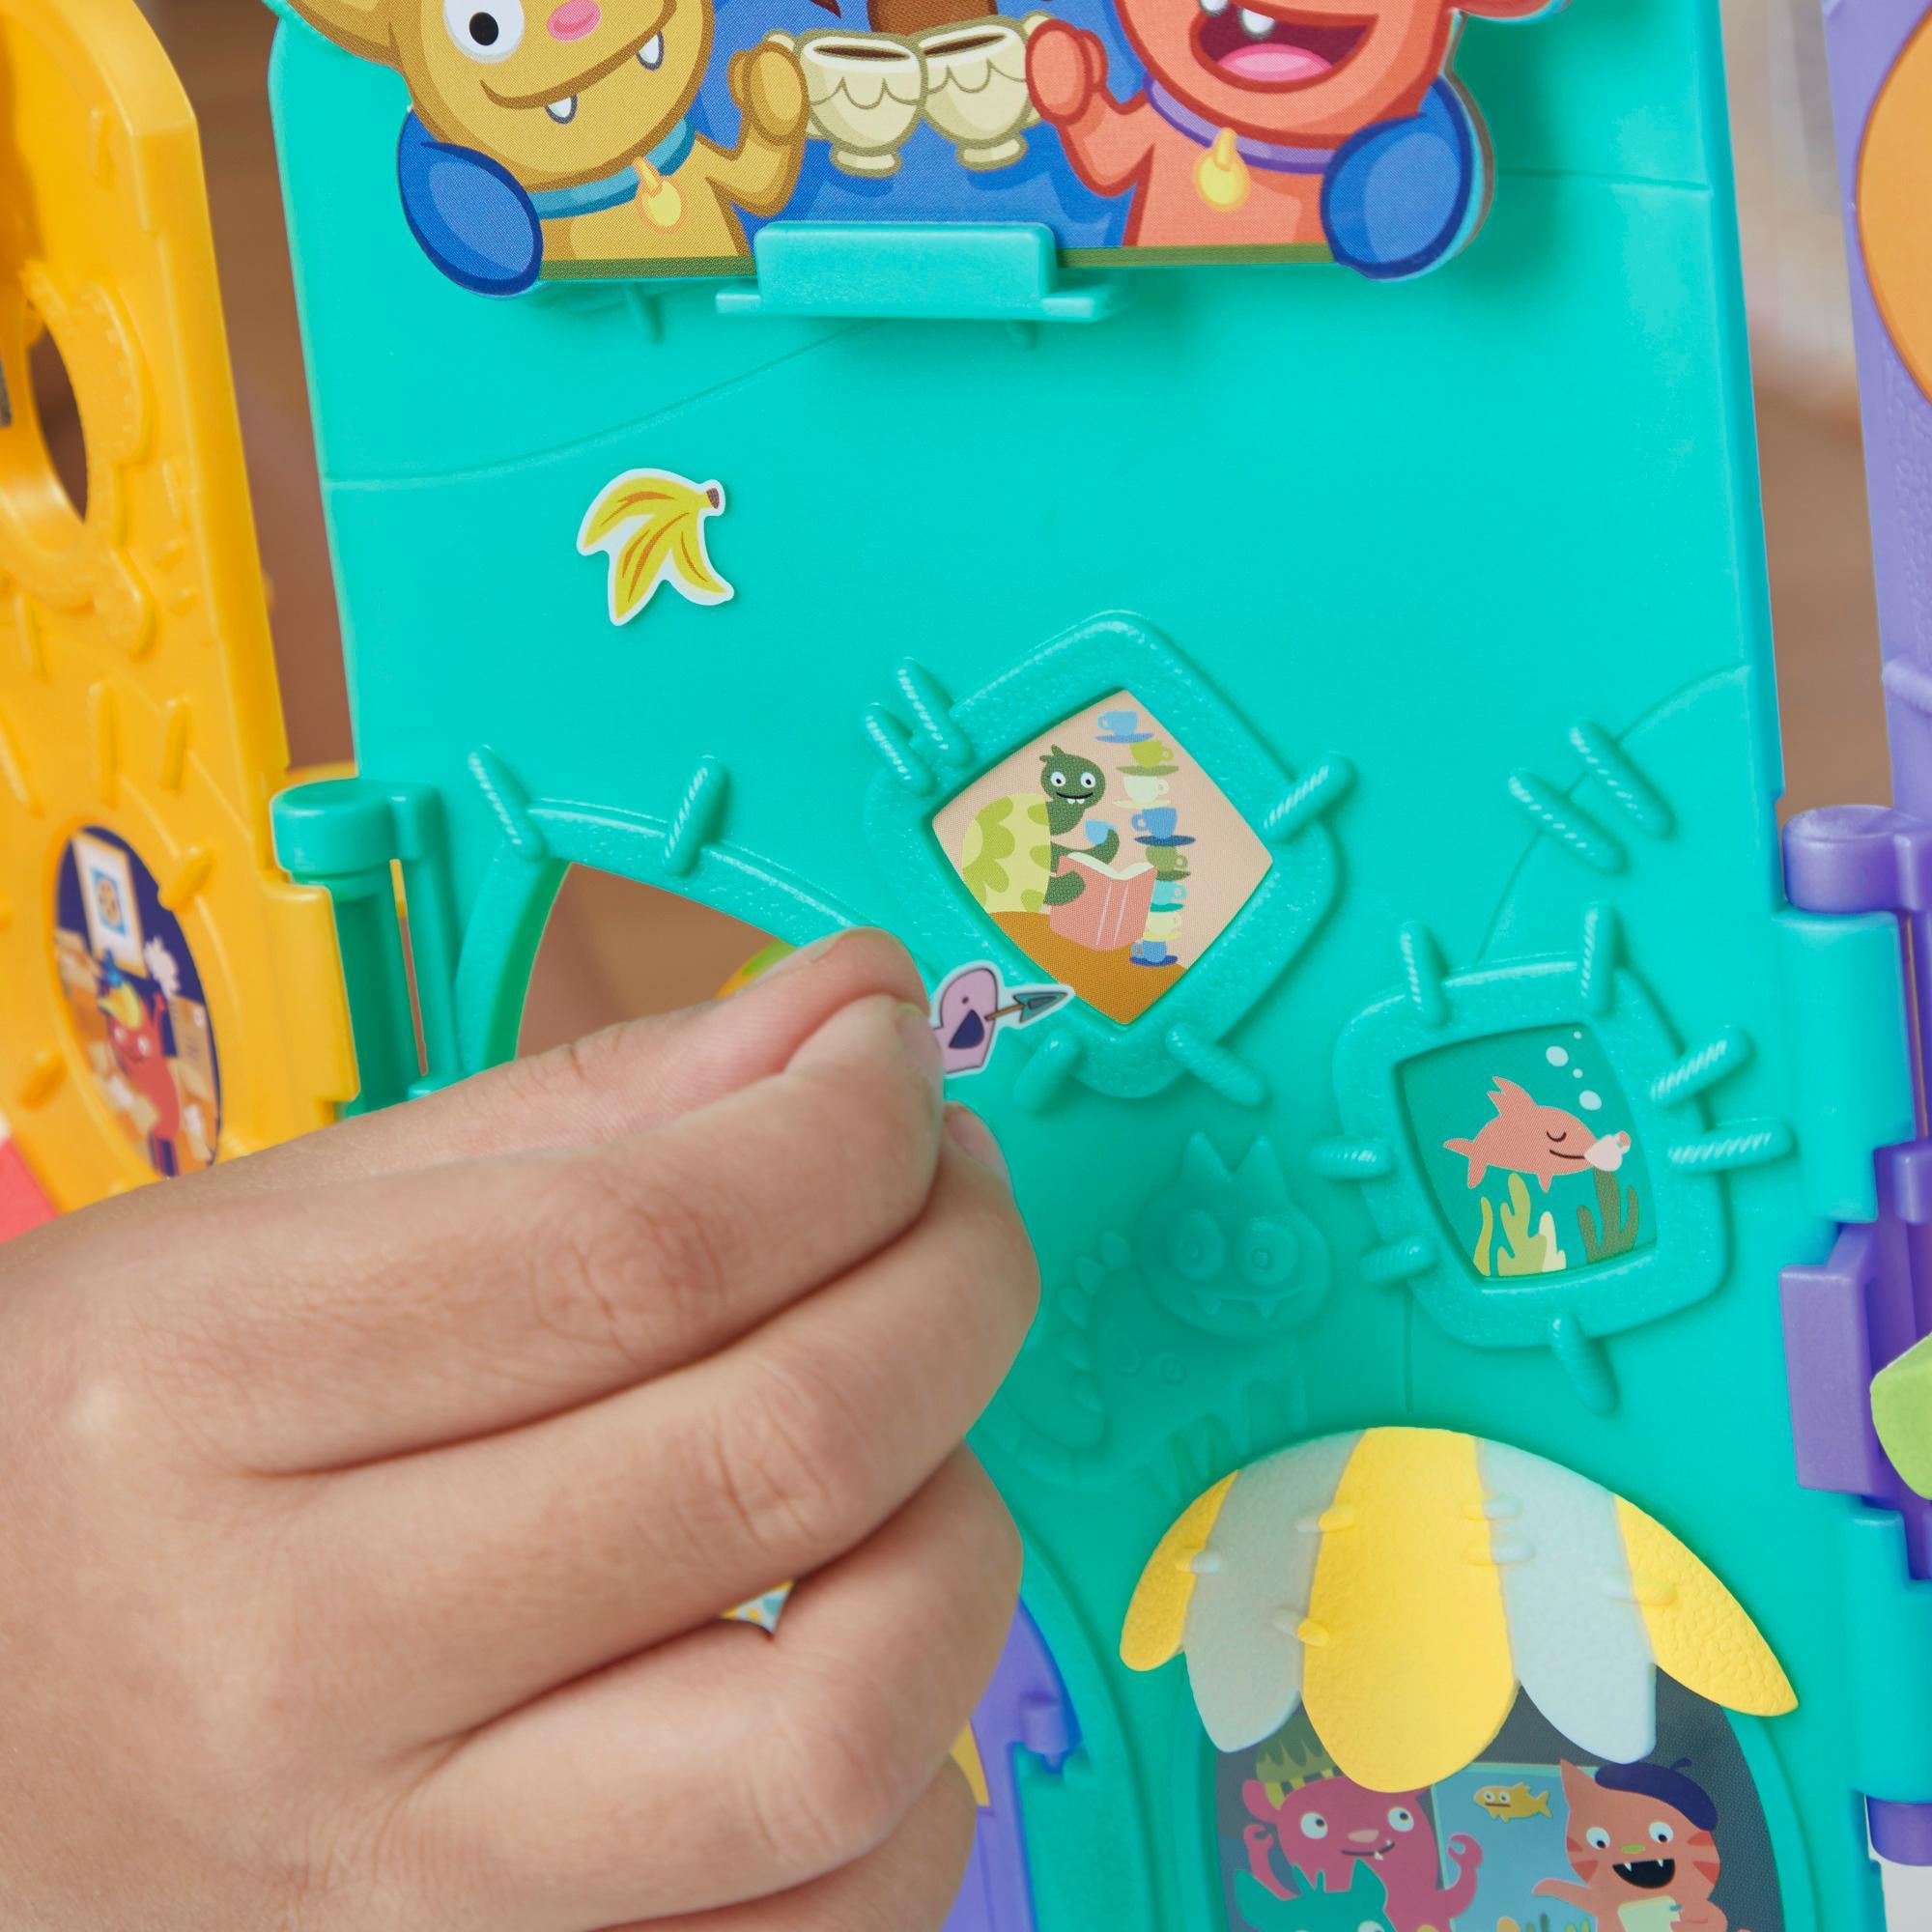 Ugly Dolls Product Thumb 12